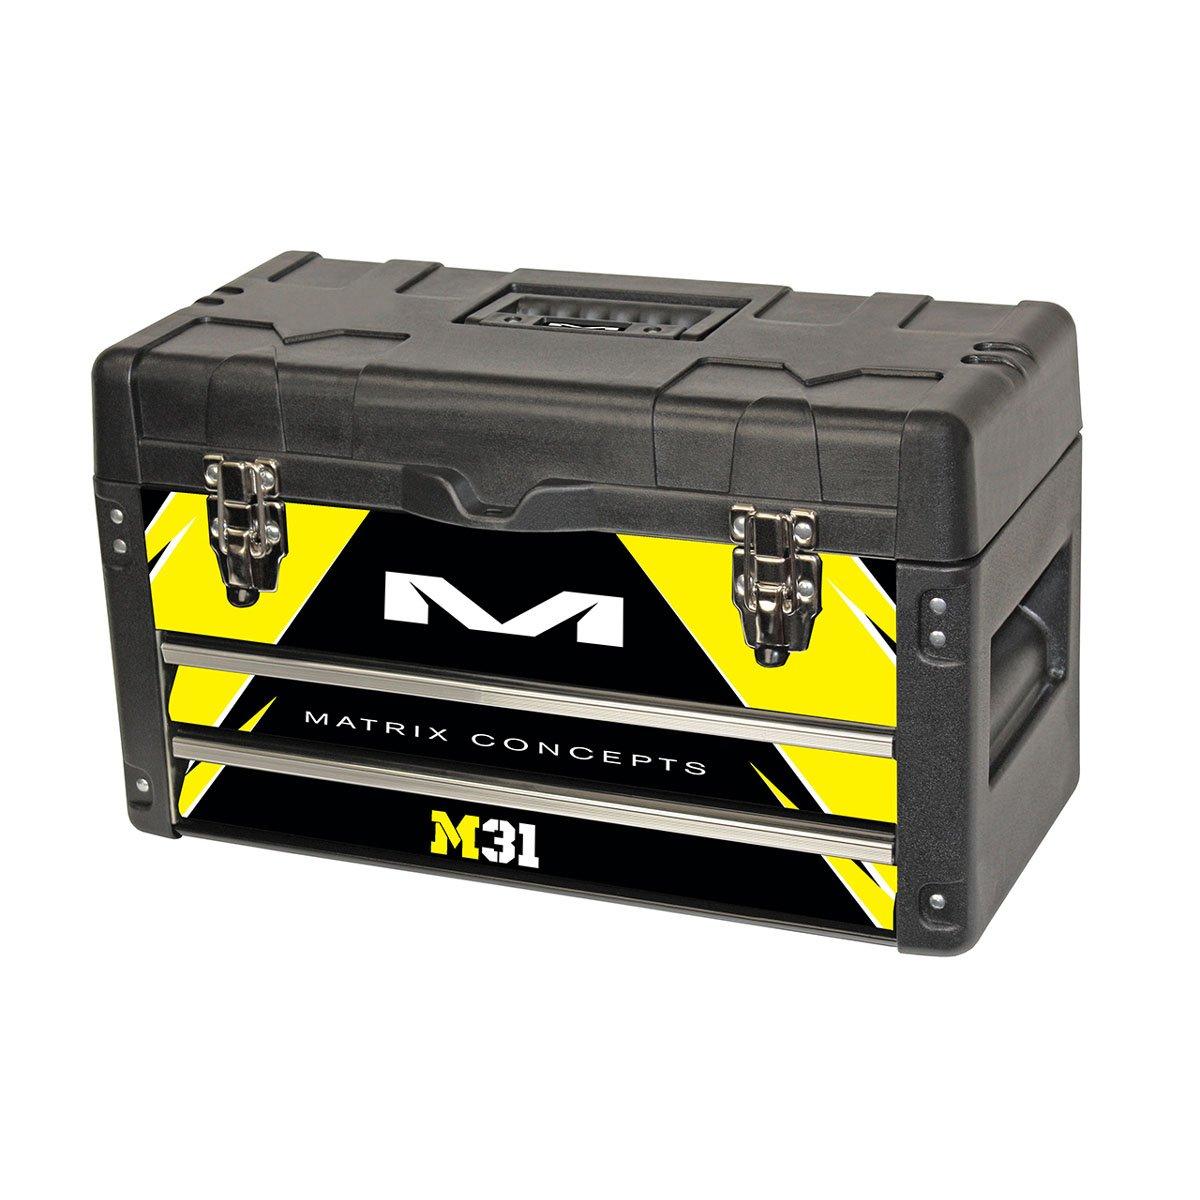 Blue Matrix Concepts M31 Worx Box